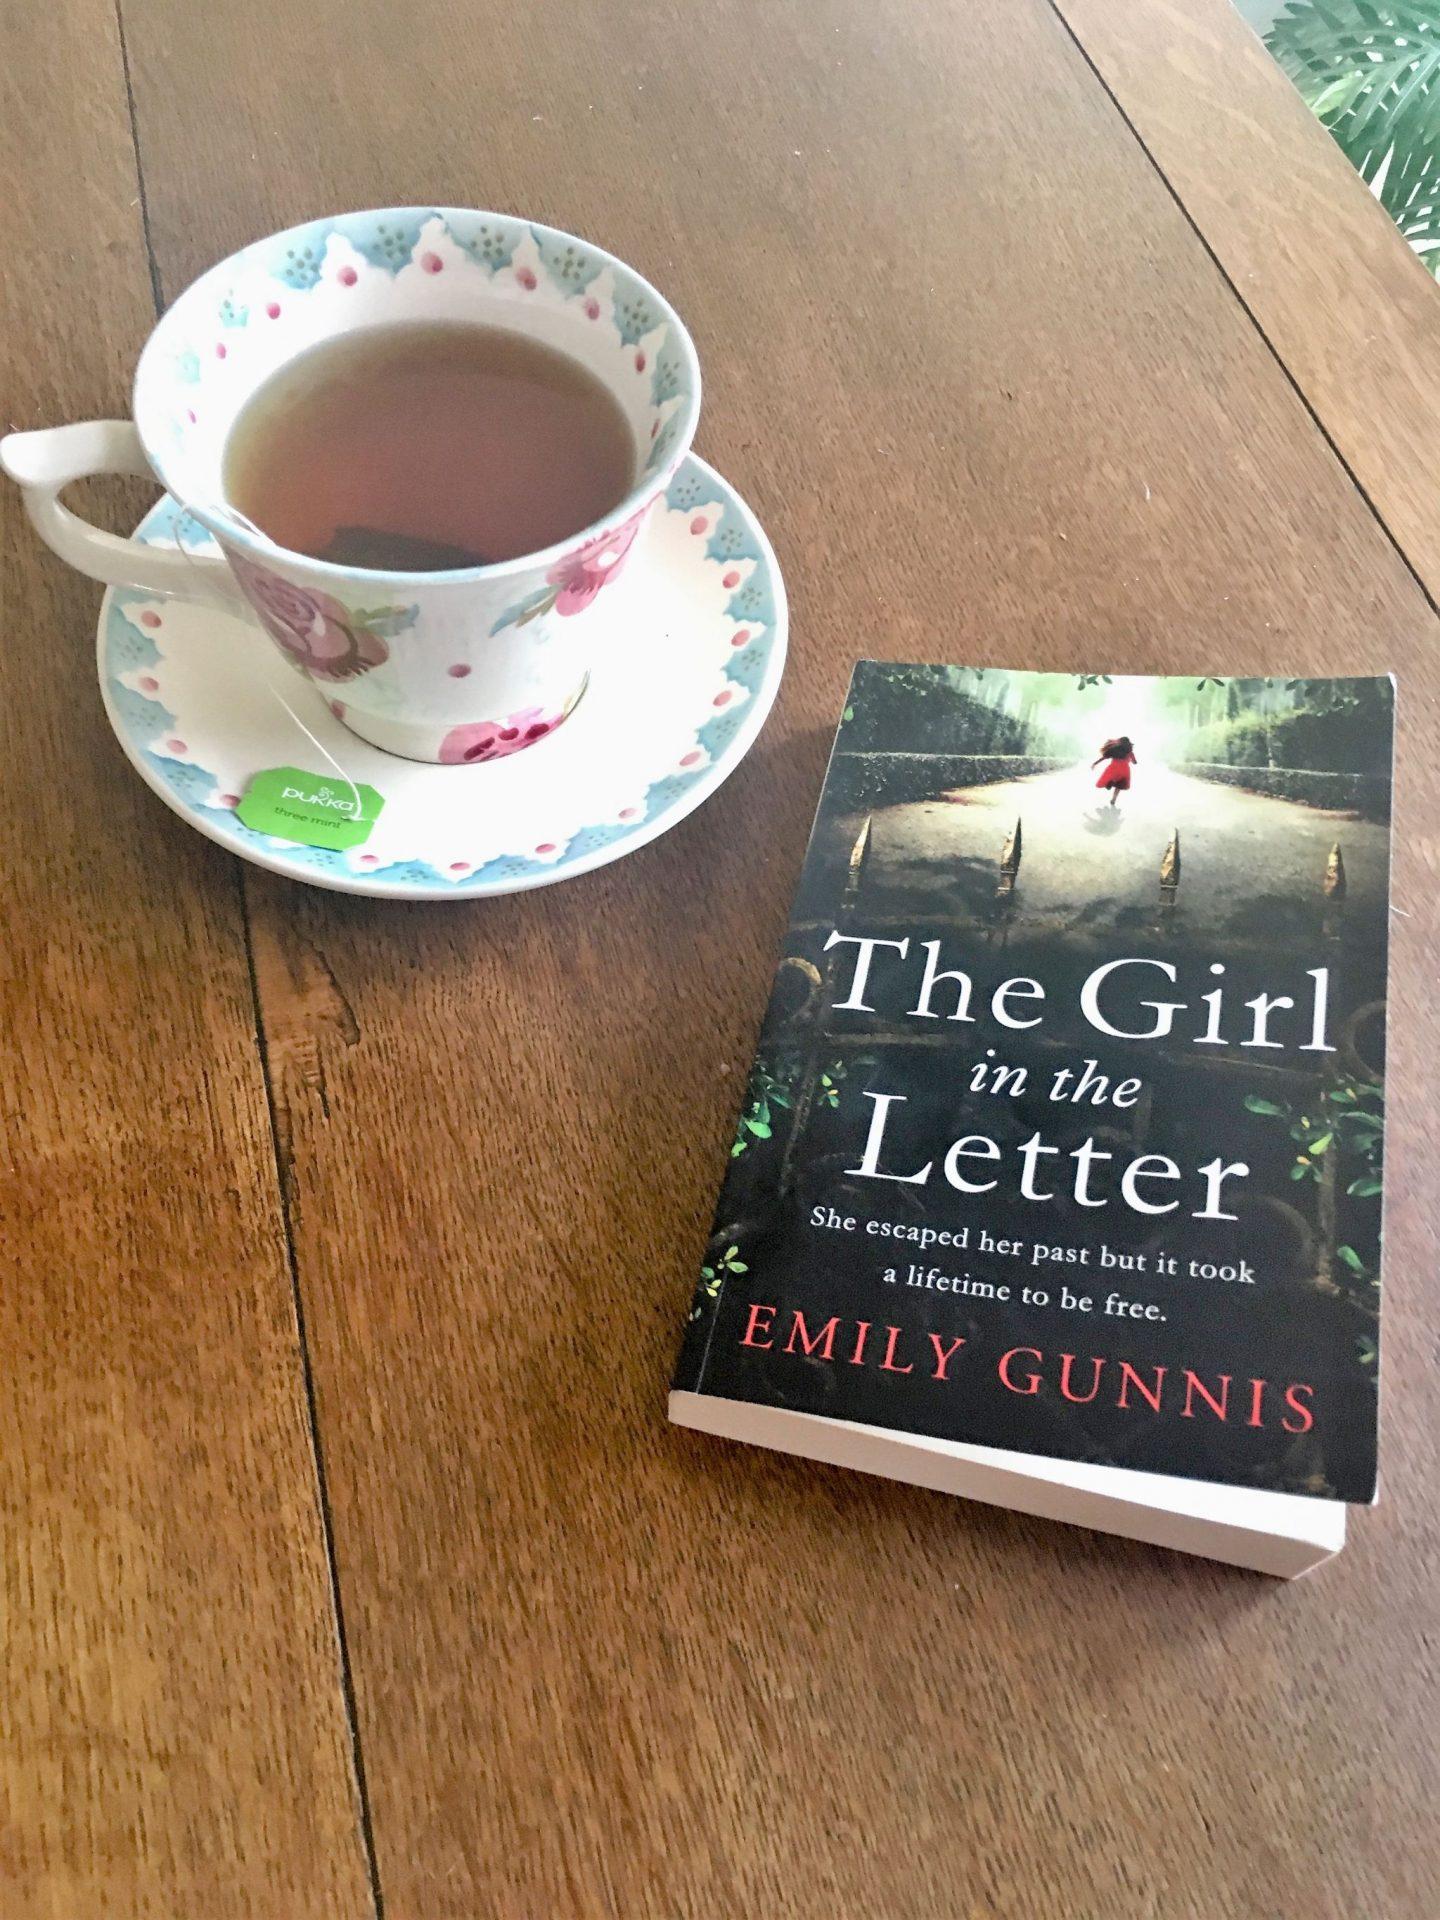 TheGirl-in-the-Letter